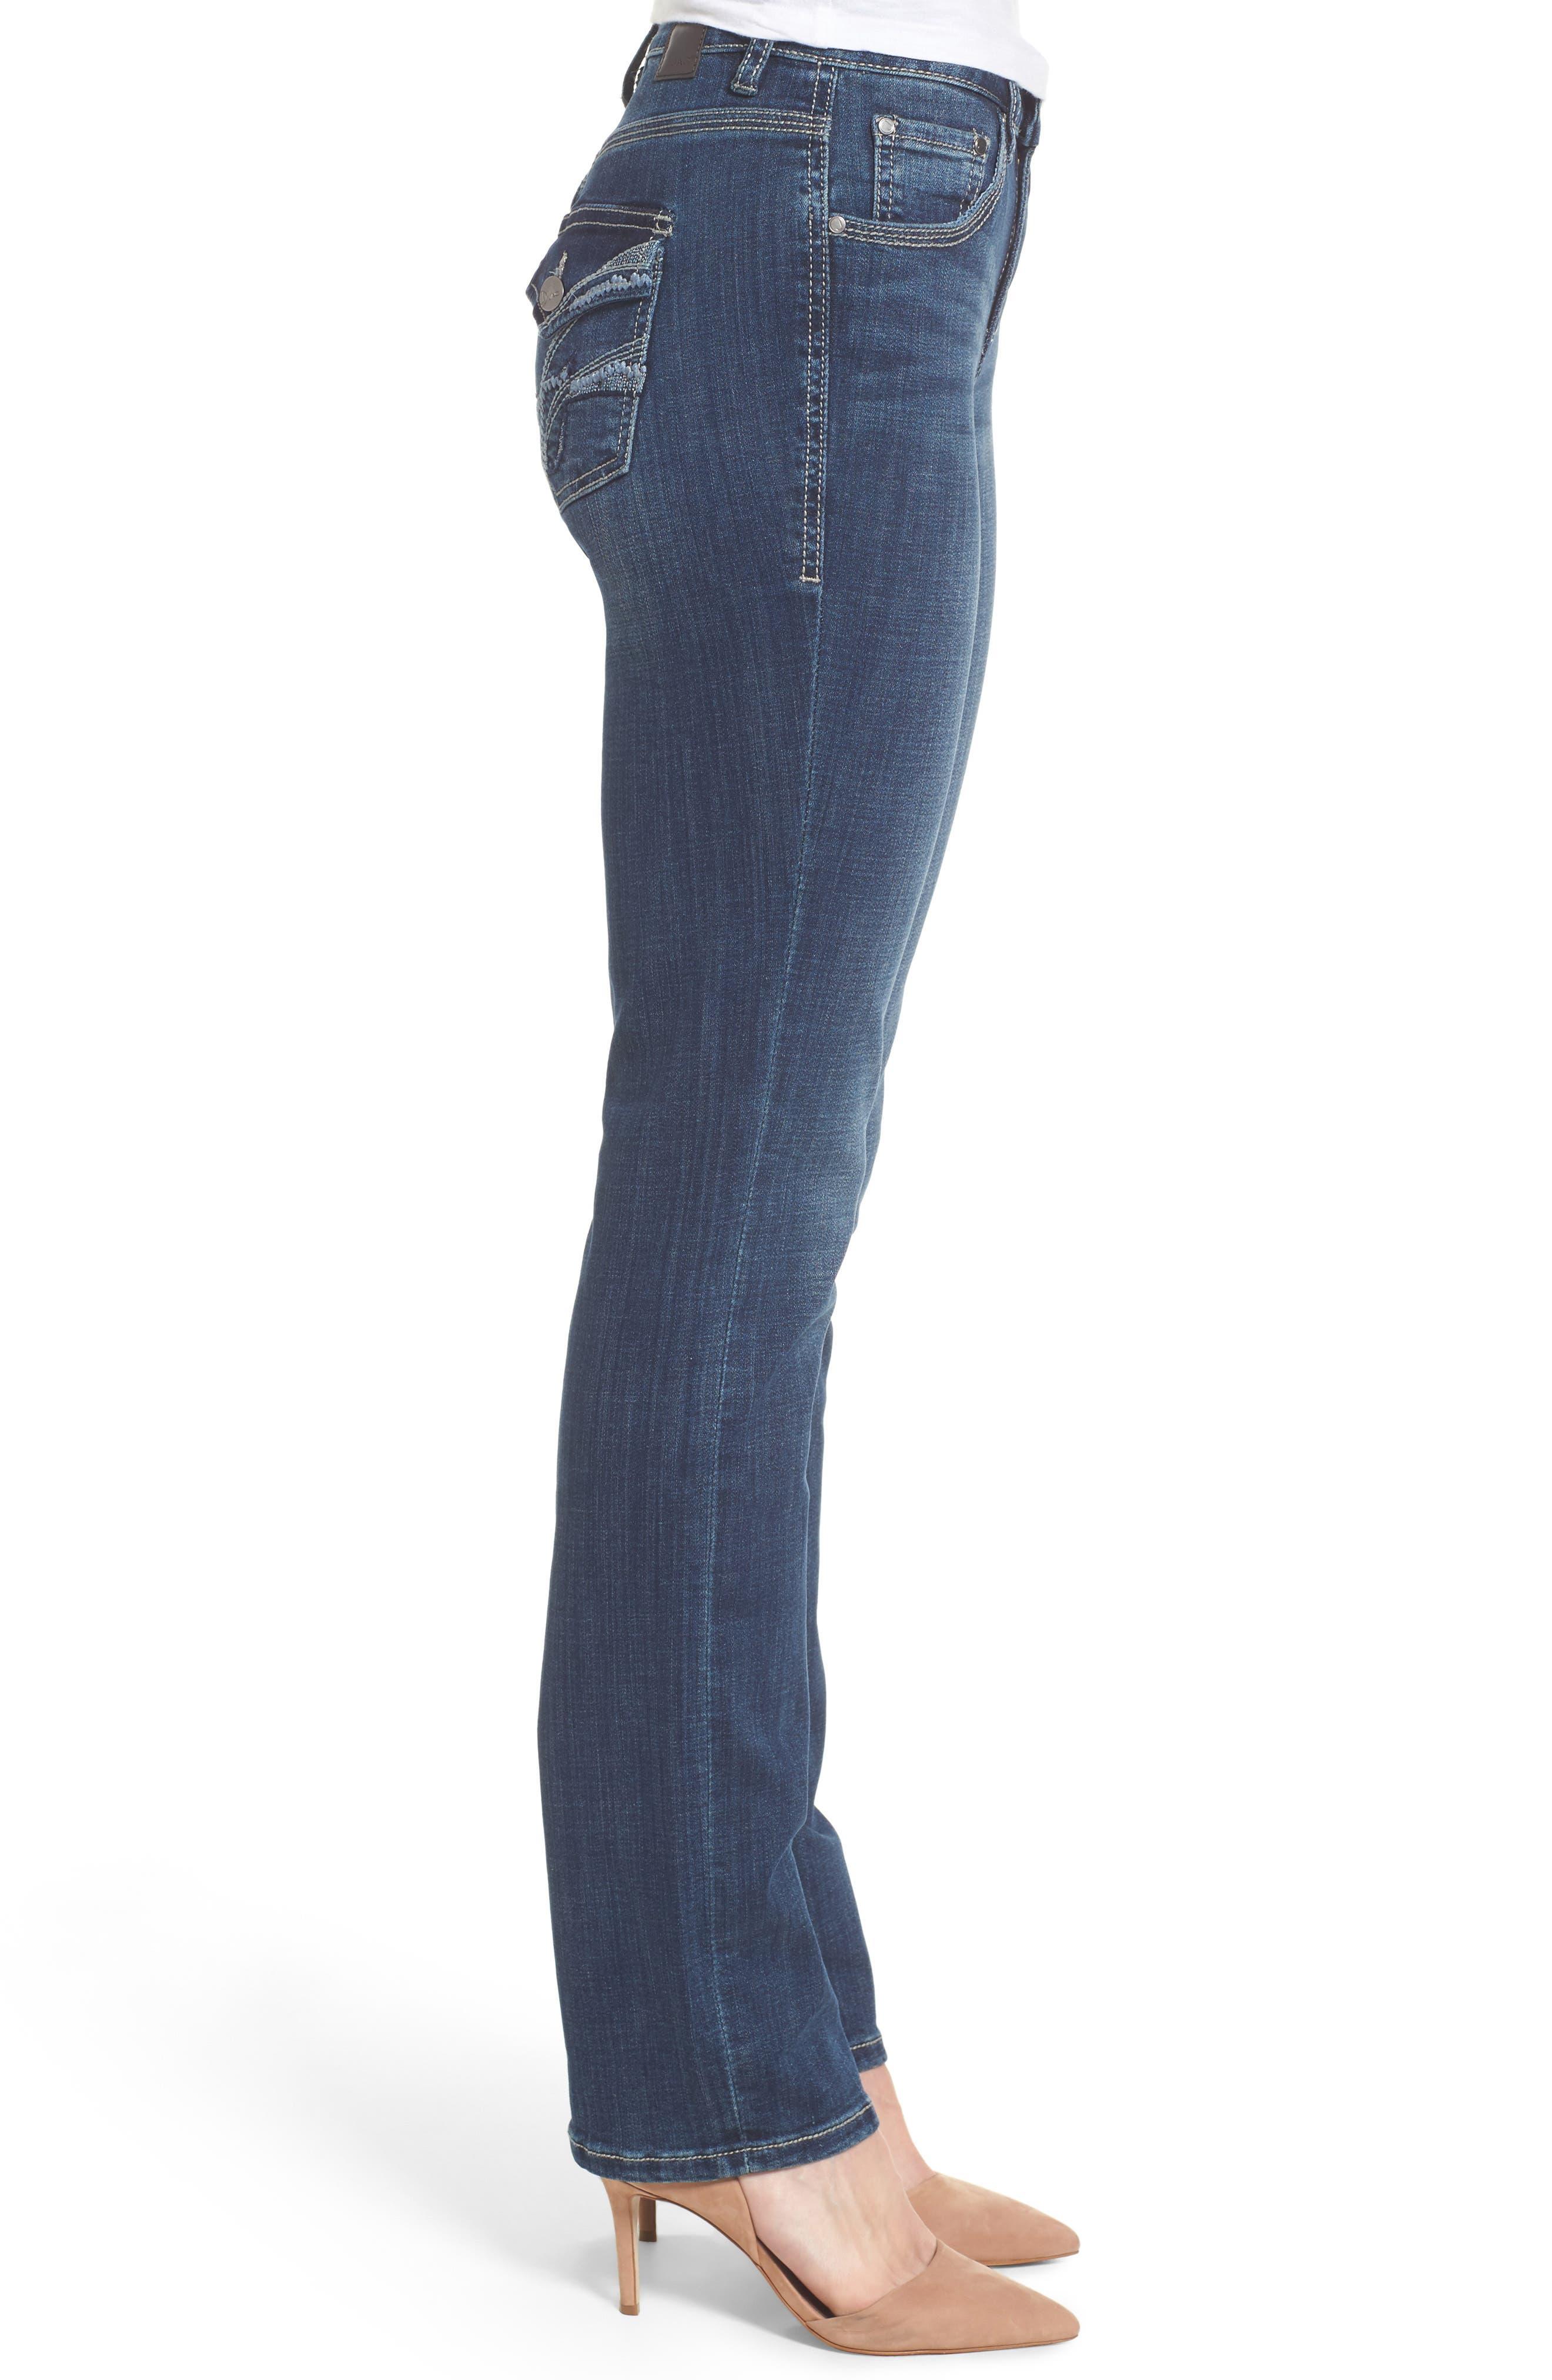 Adrian Straight Leg Jeans,                             Alternate thumbnail 3, color,                             Thorne Blue